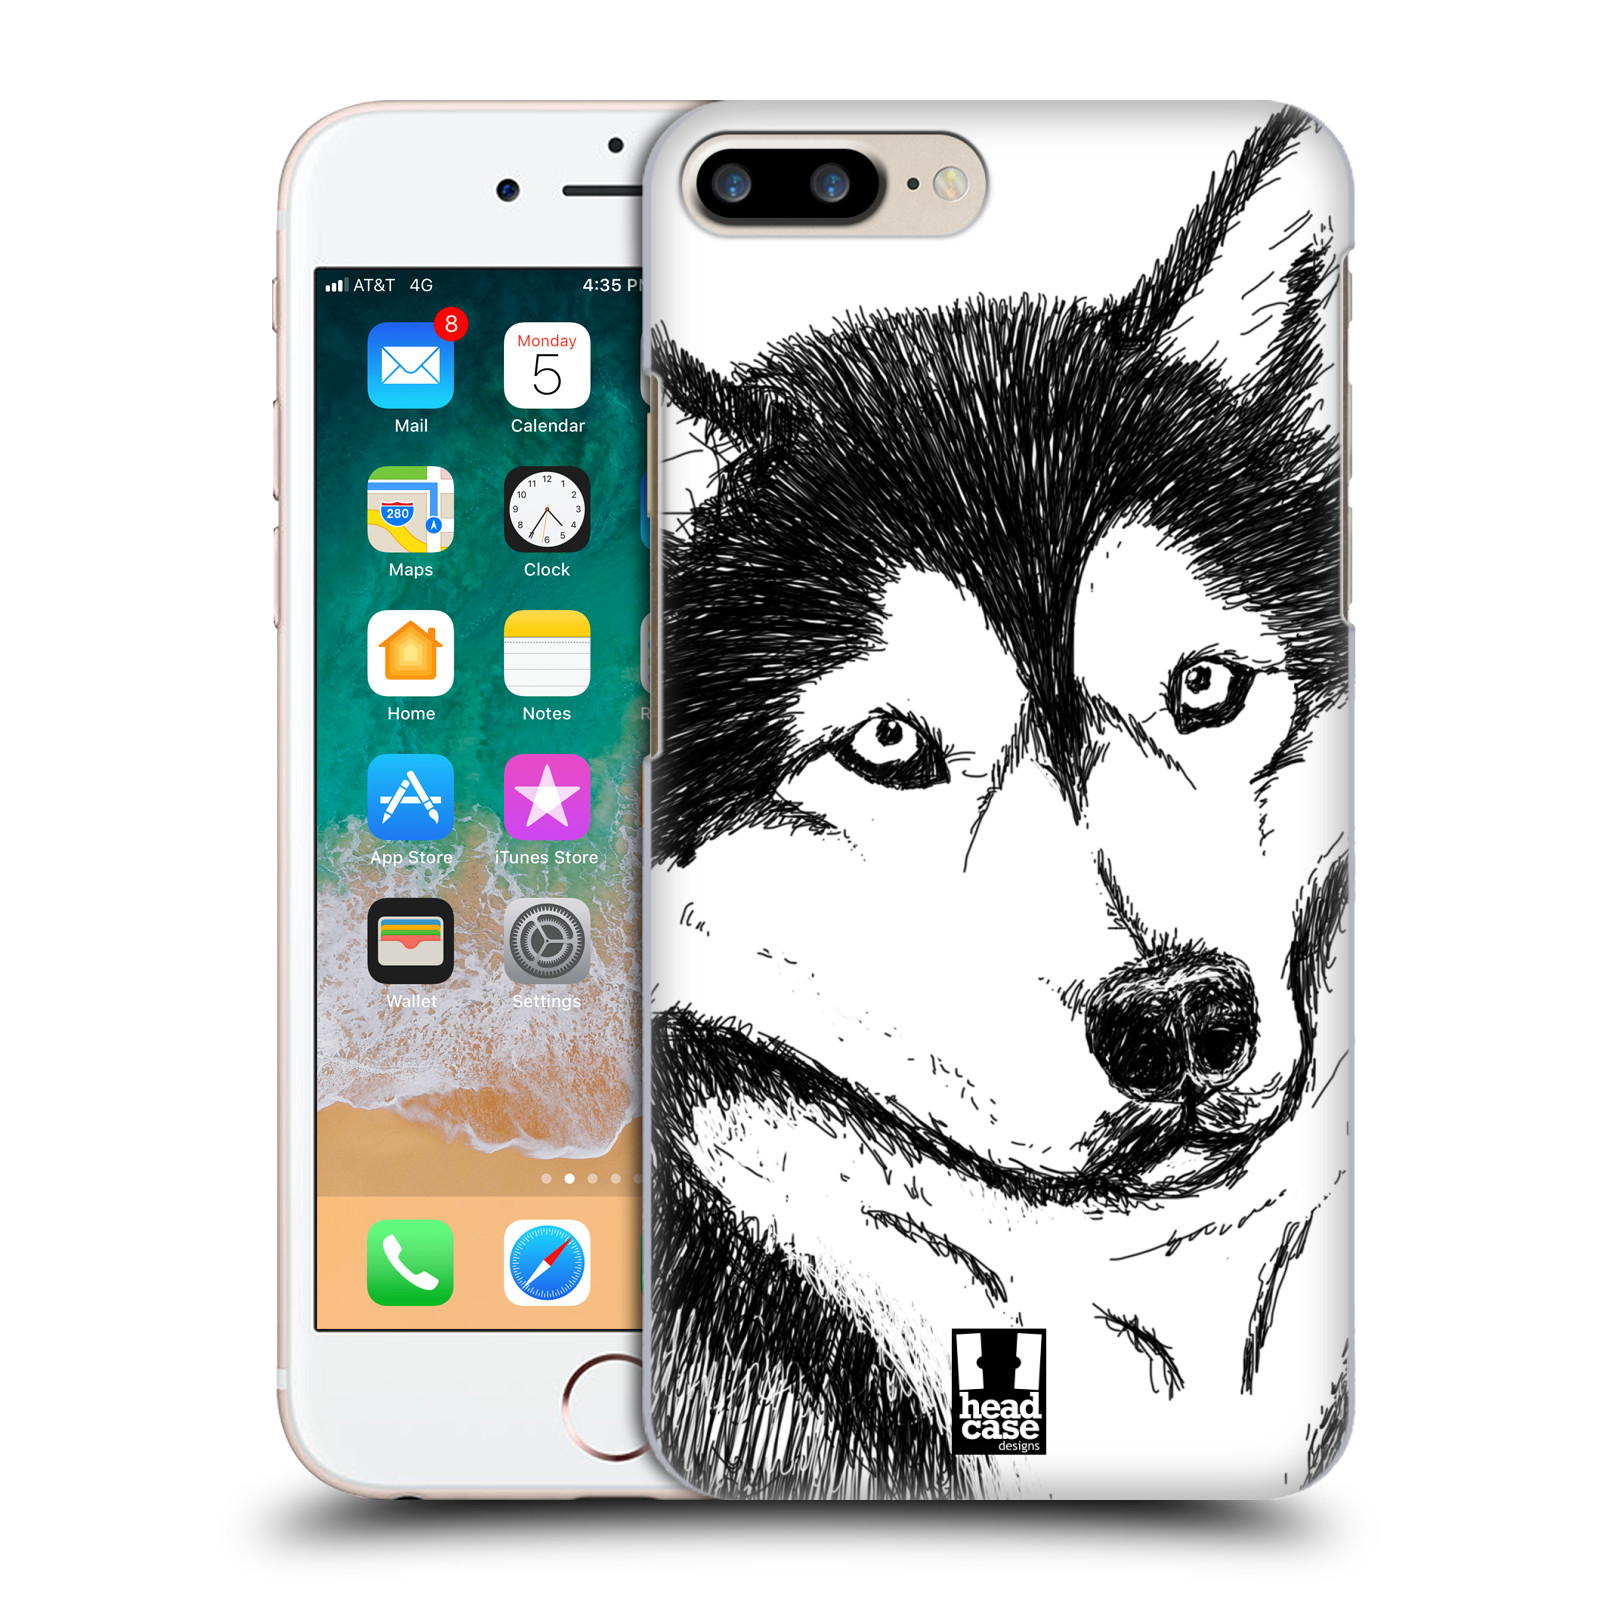 HEAD CASE plastový obal na mobil Apple Iphone 7 PLUS vzor Kreslená zvířátka černá a bílá pes husky